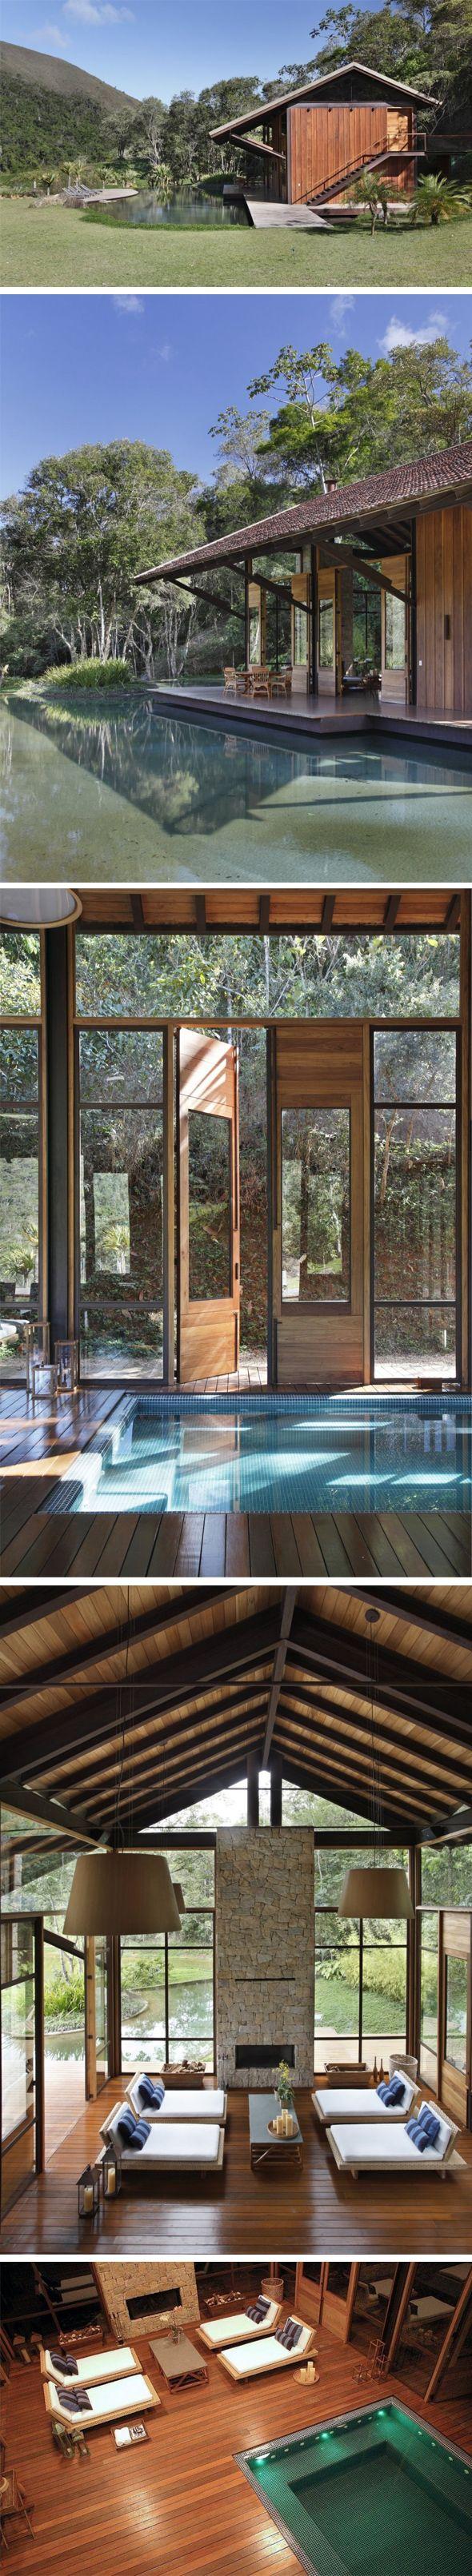 Résidence-Itaipava-Cadas-Arquitetura-2  YESS!!!! tropical tropical